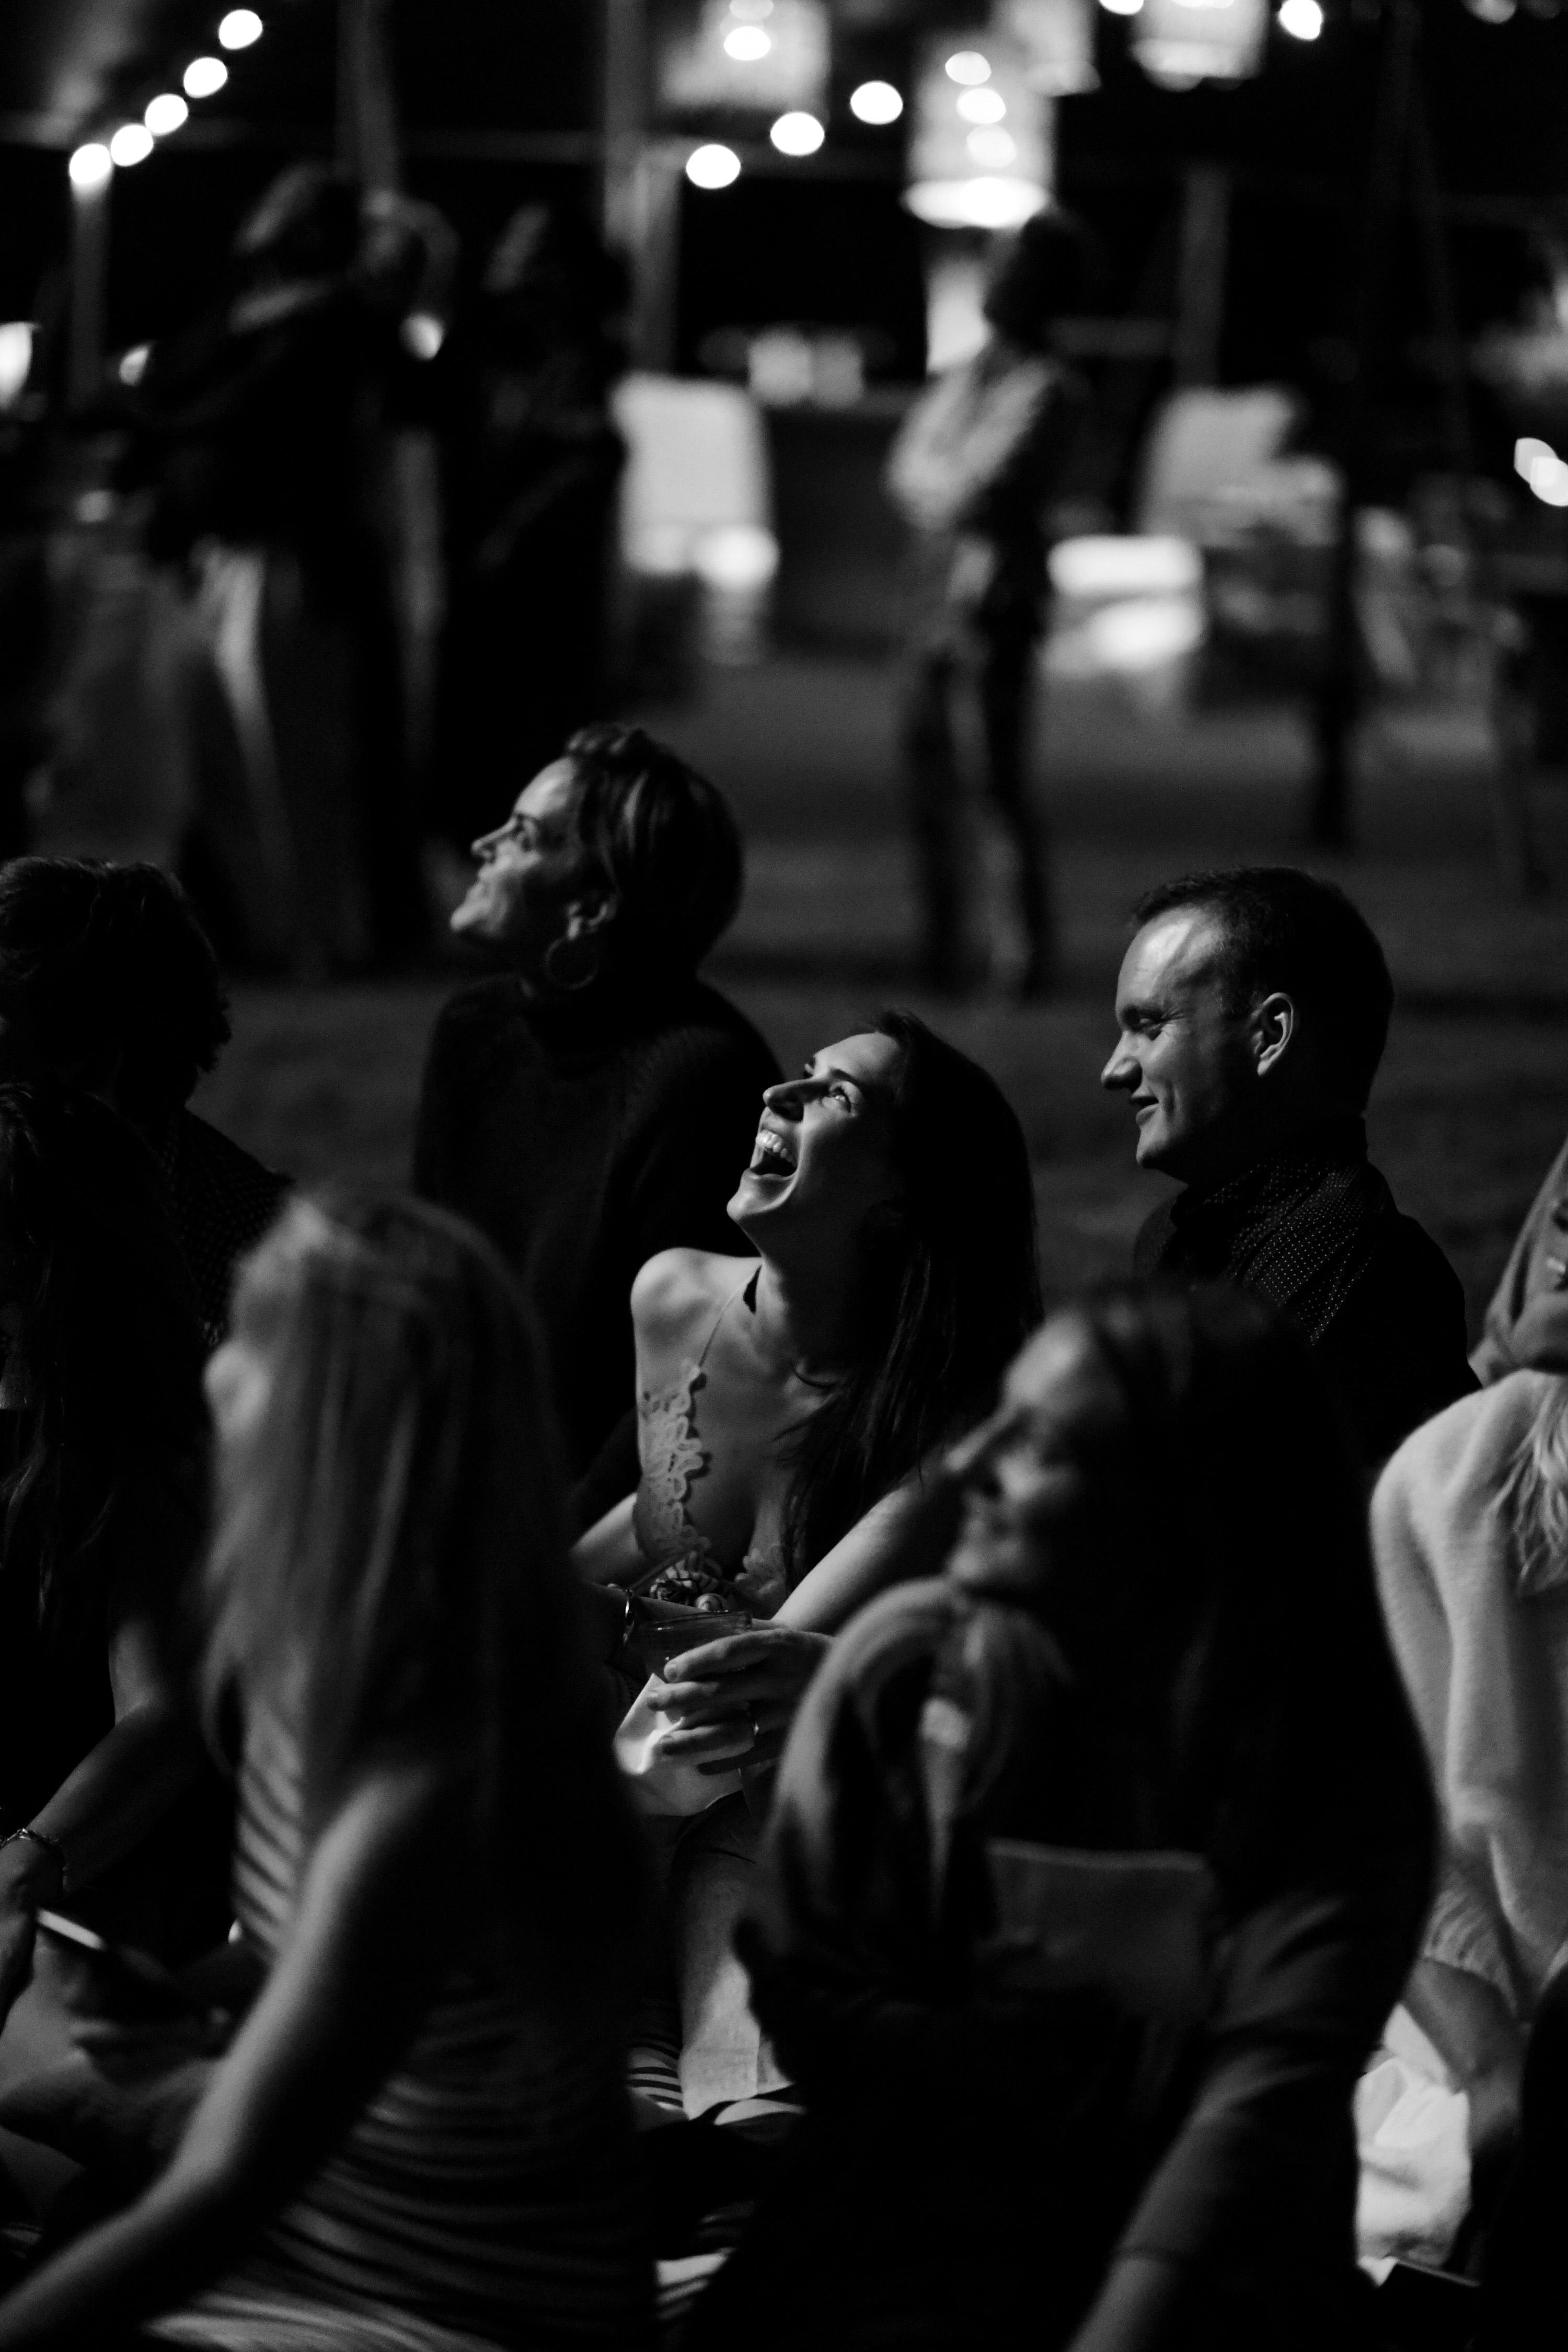 crowd watching fireworks patriotic party